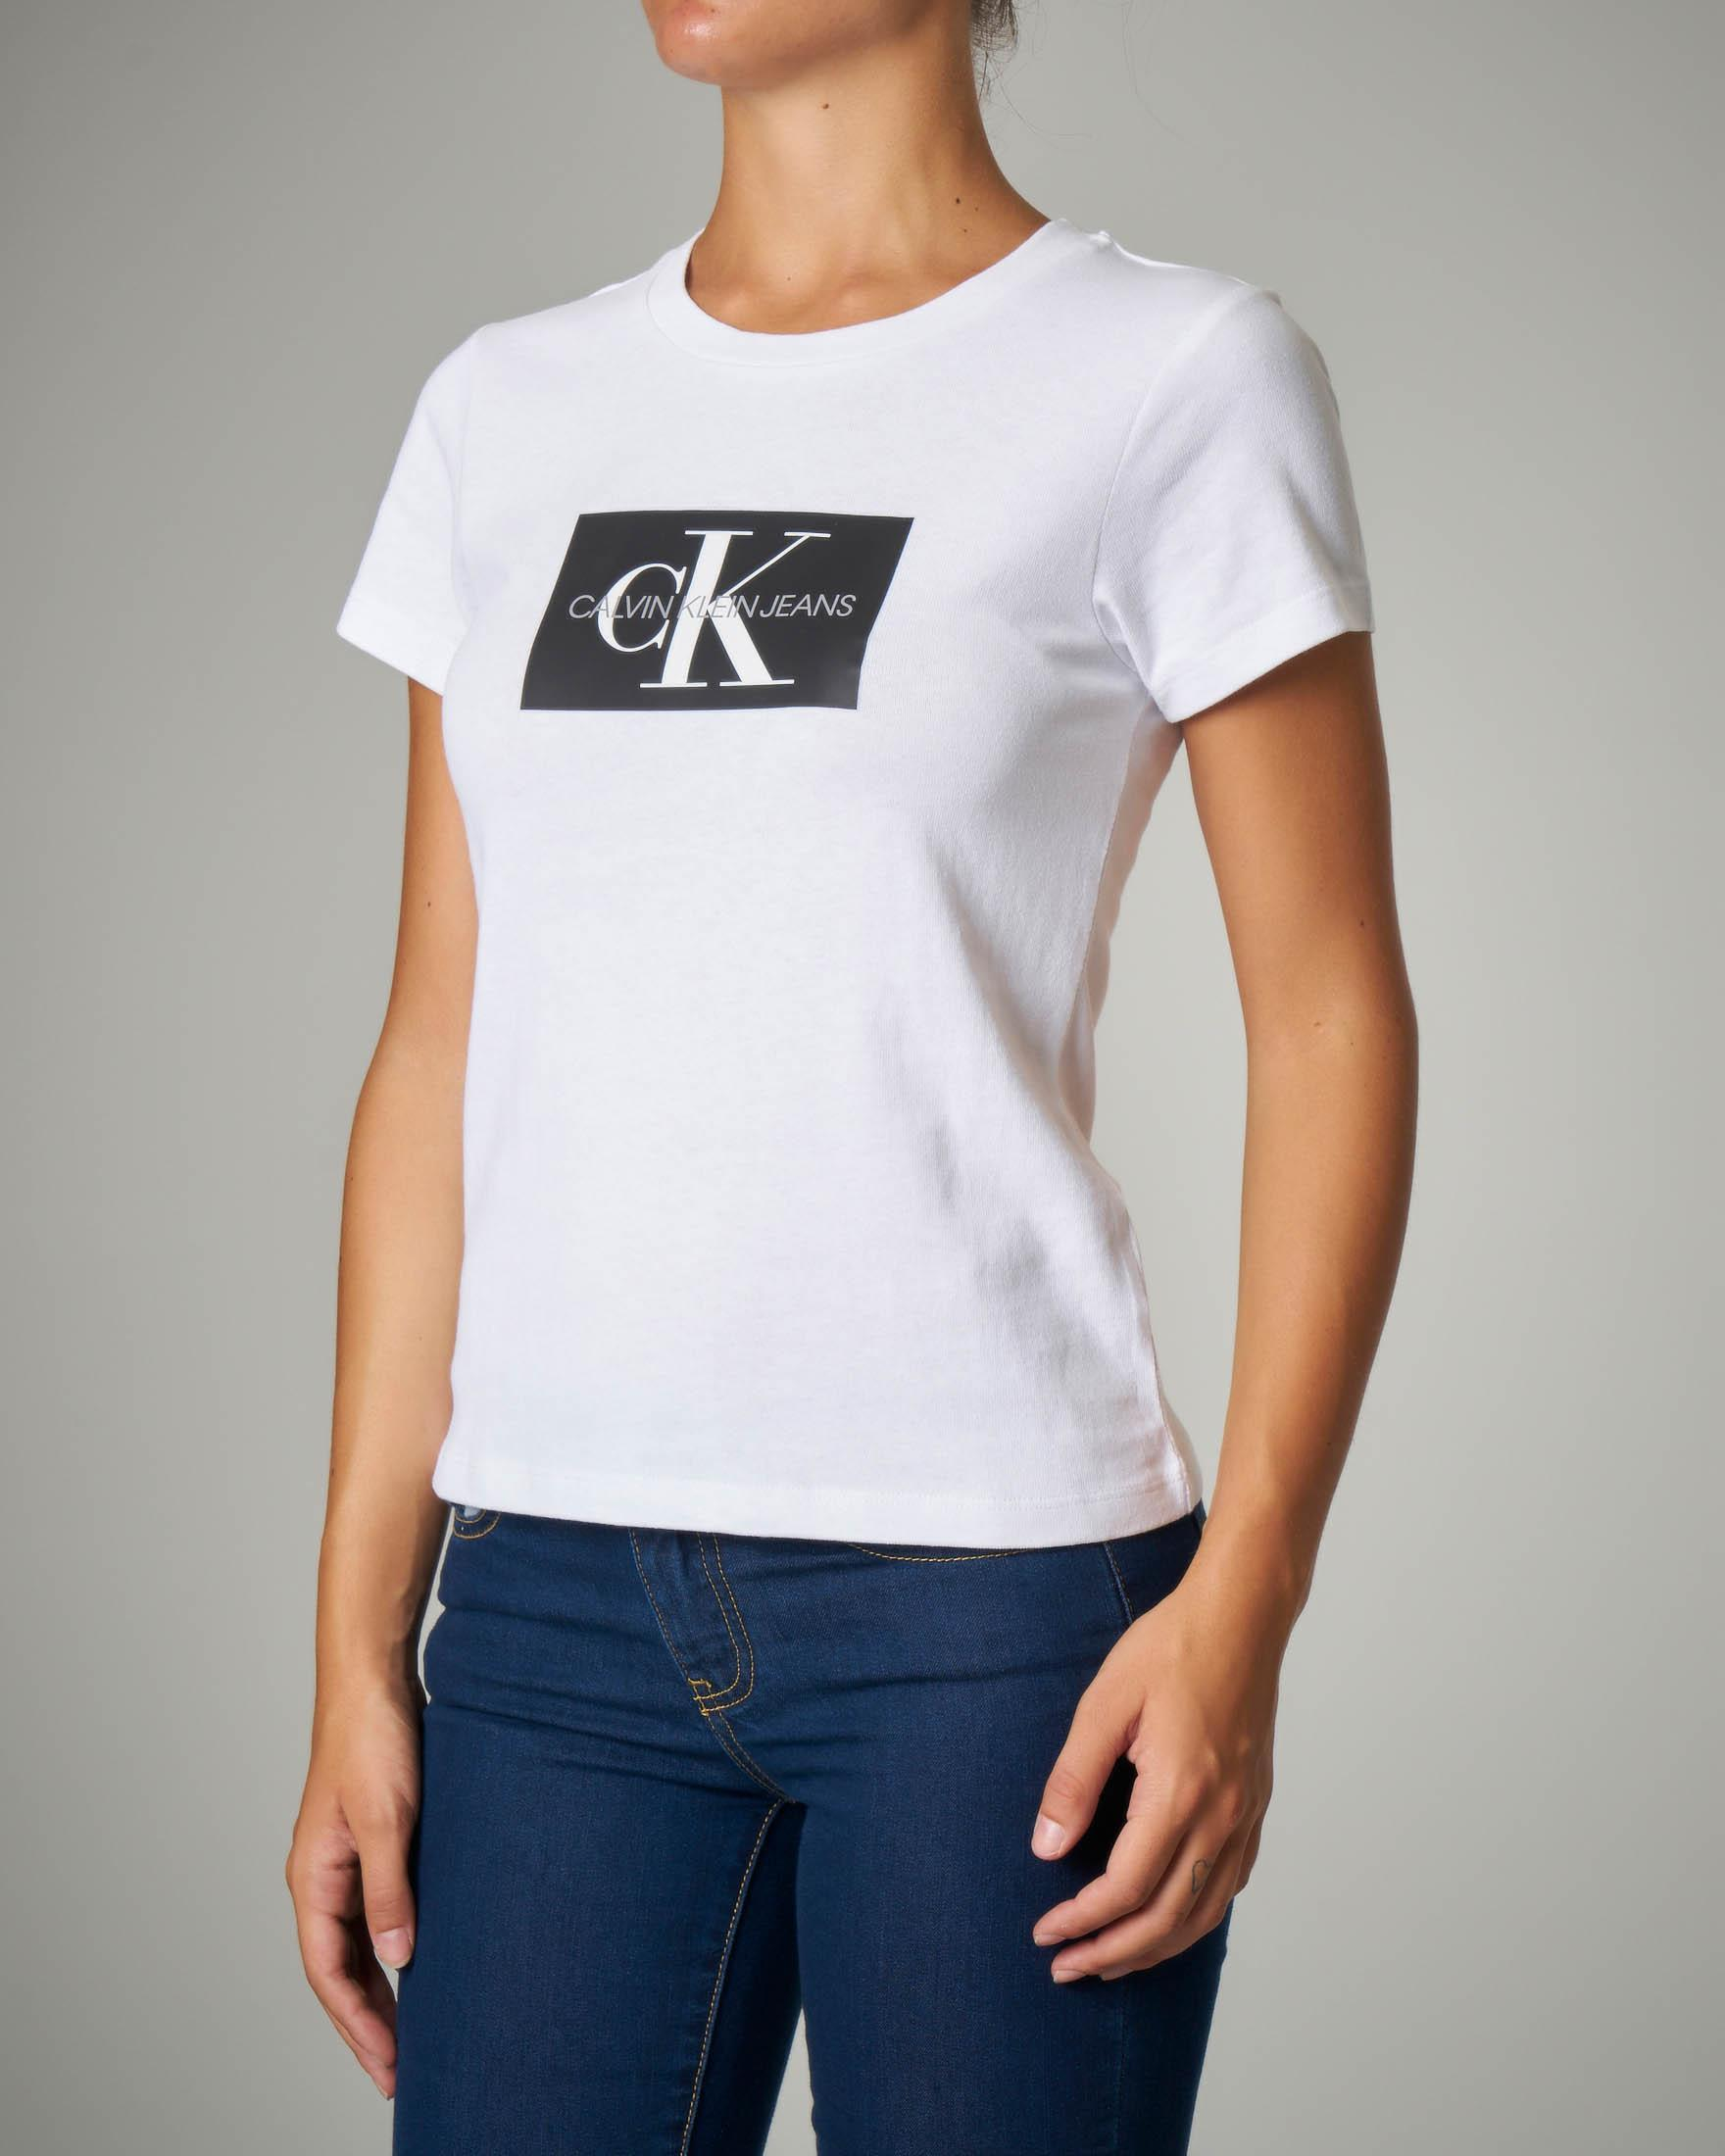 T-shirt bianca in cotone con logo